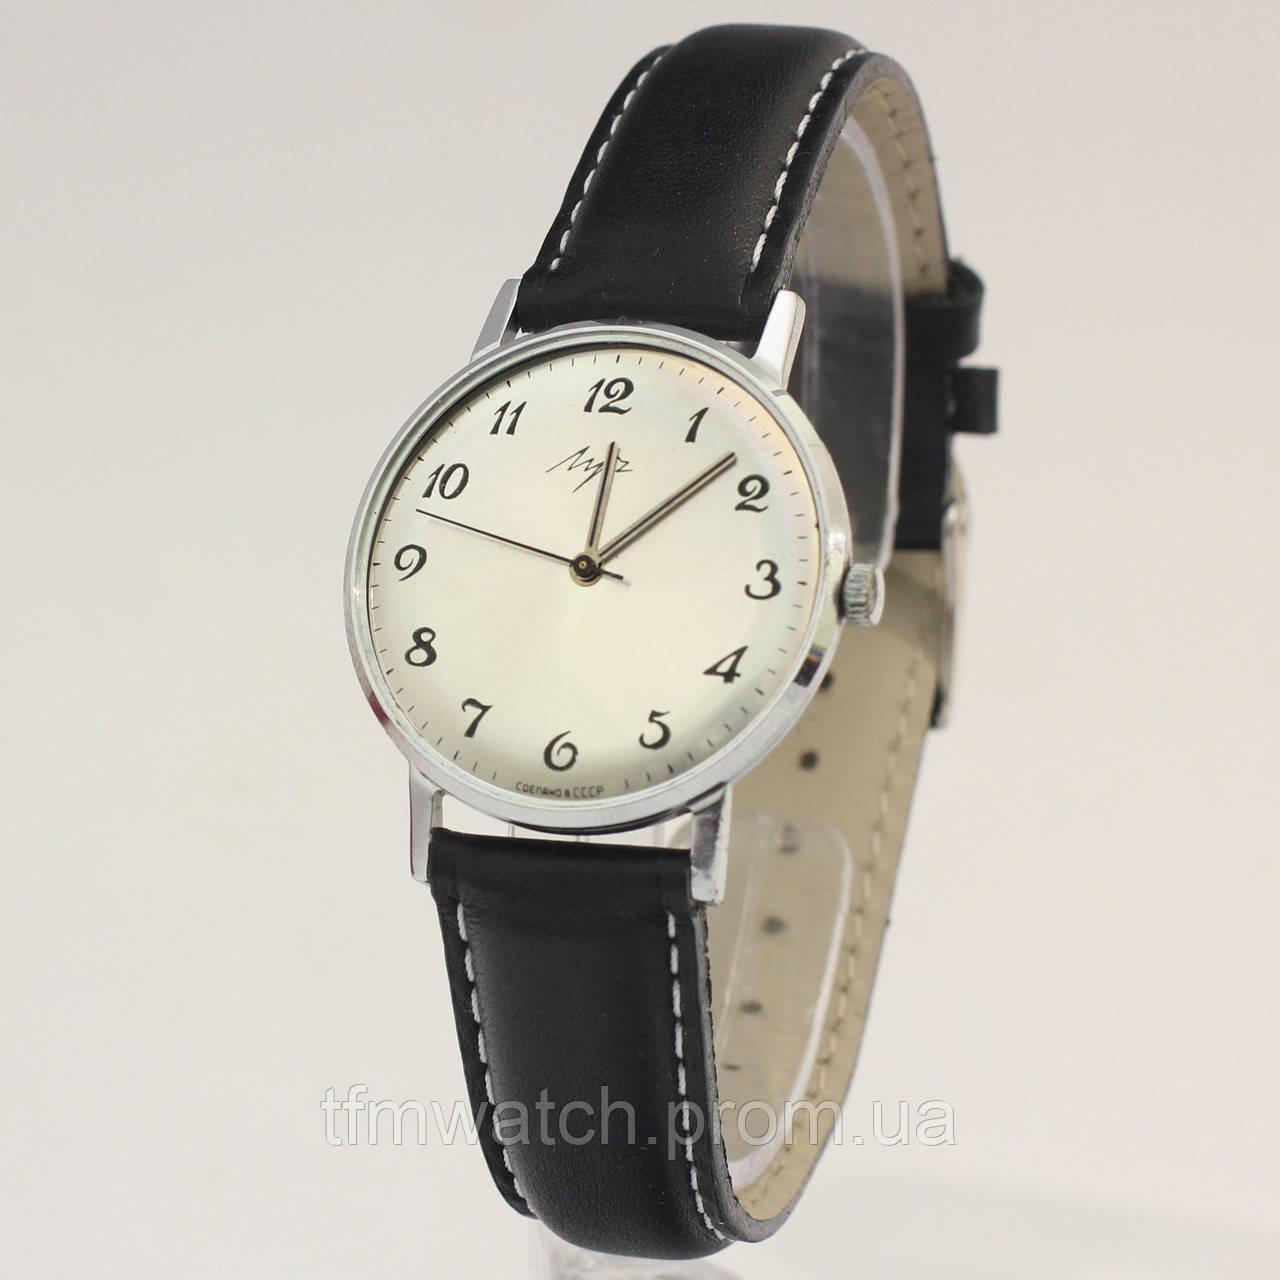 Луч наручные часы СССР